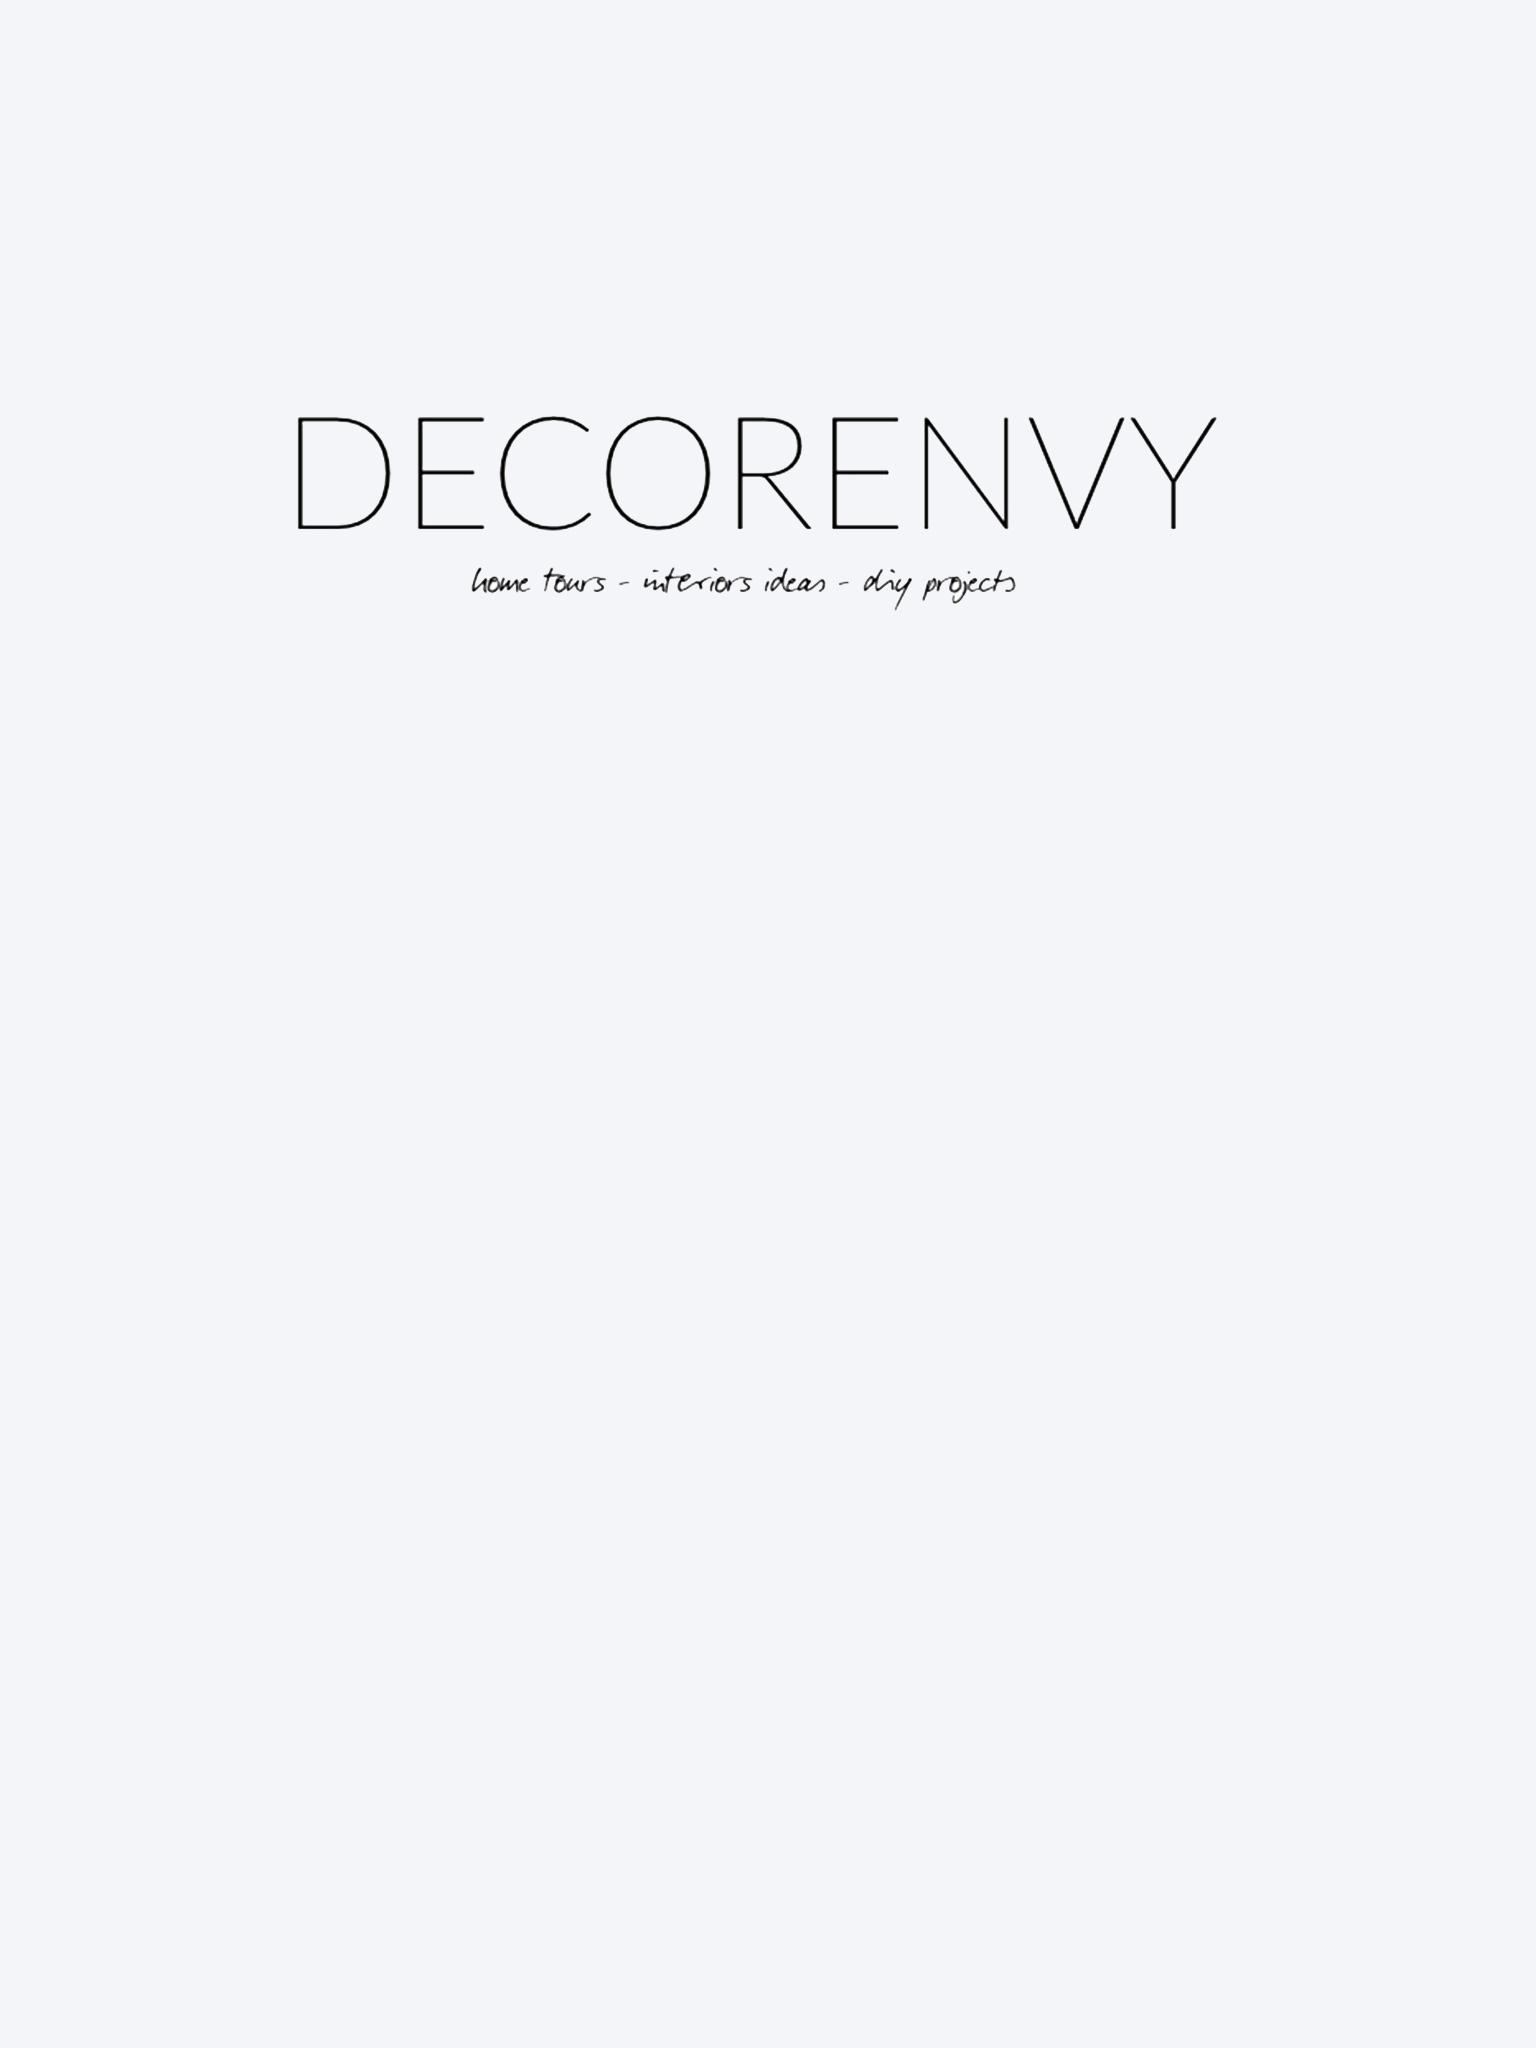 Decorenvy – May 16